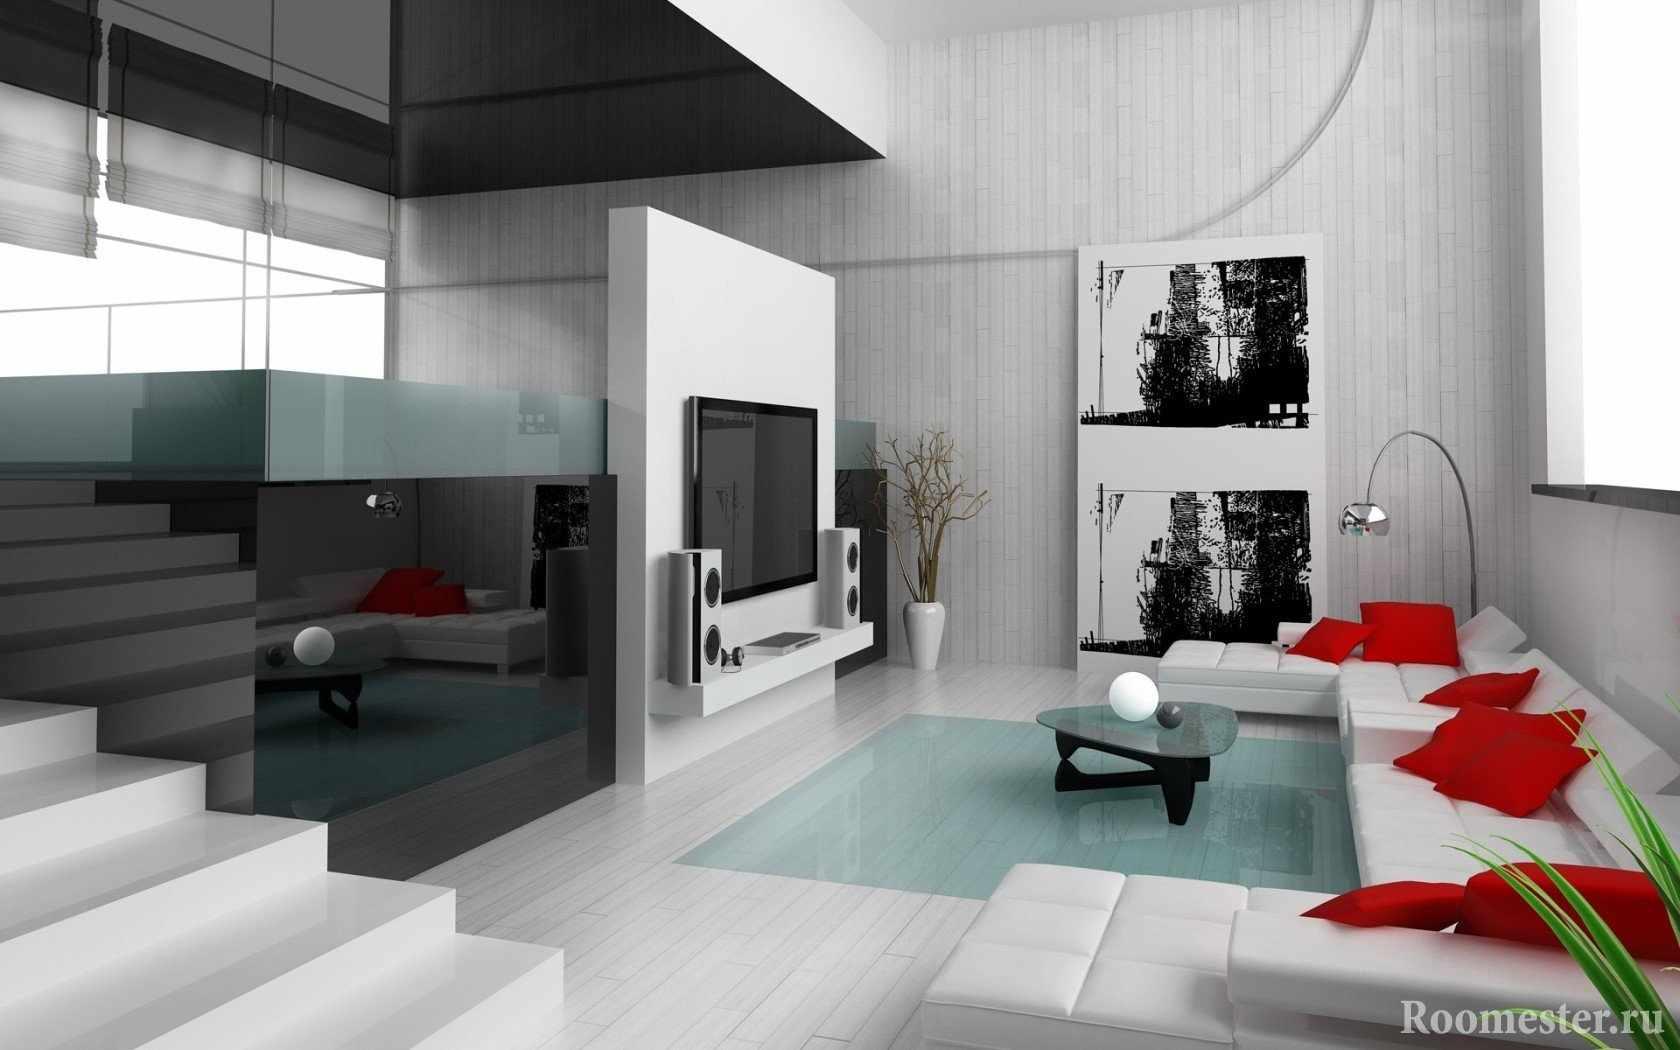 Красные подушки на белом диване перед телевизором